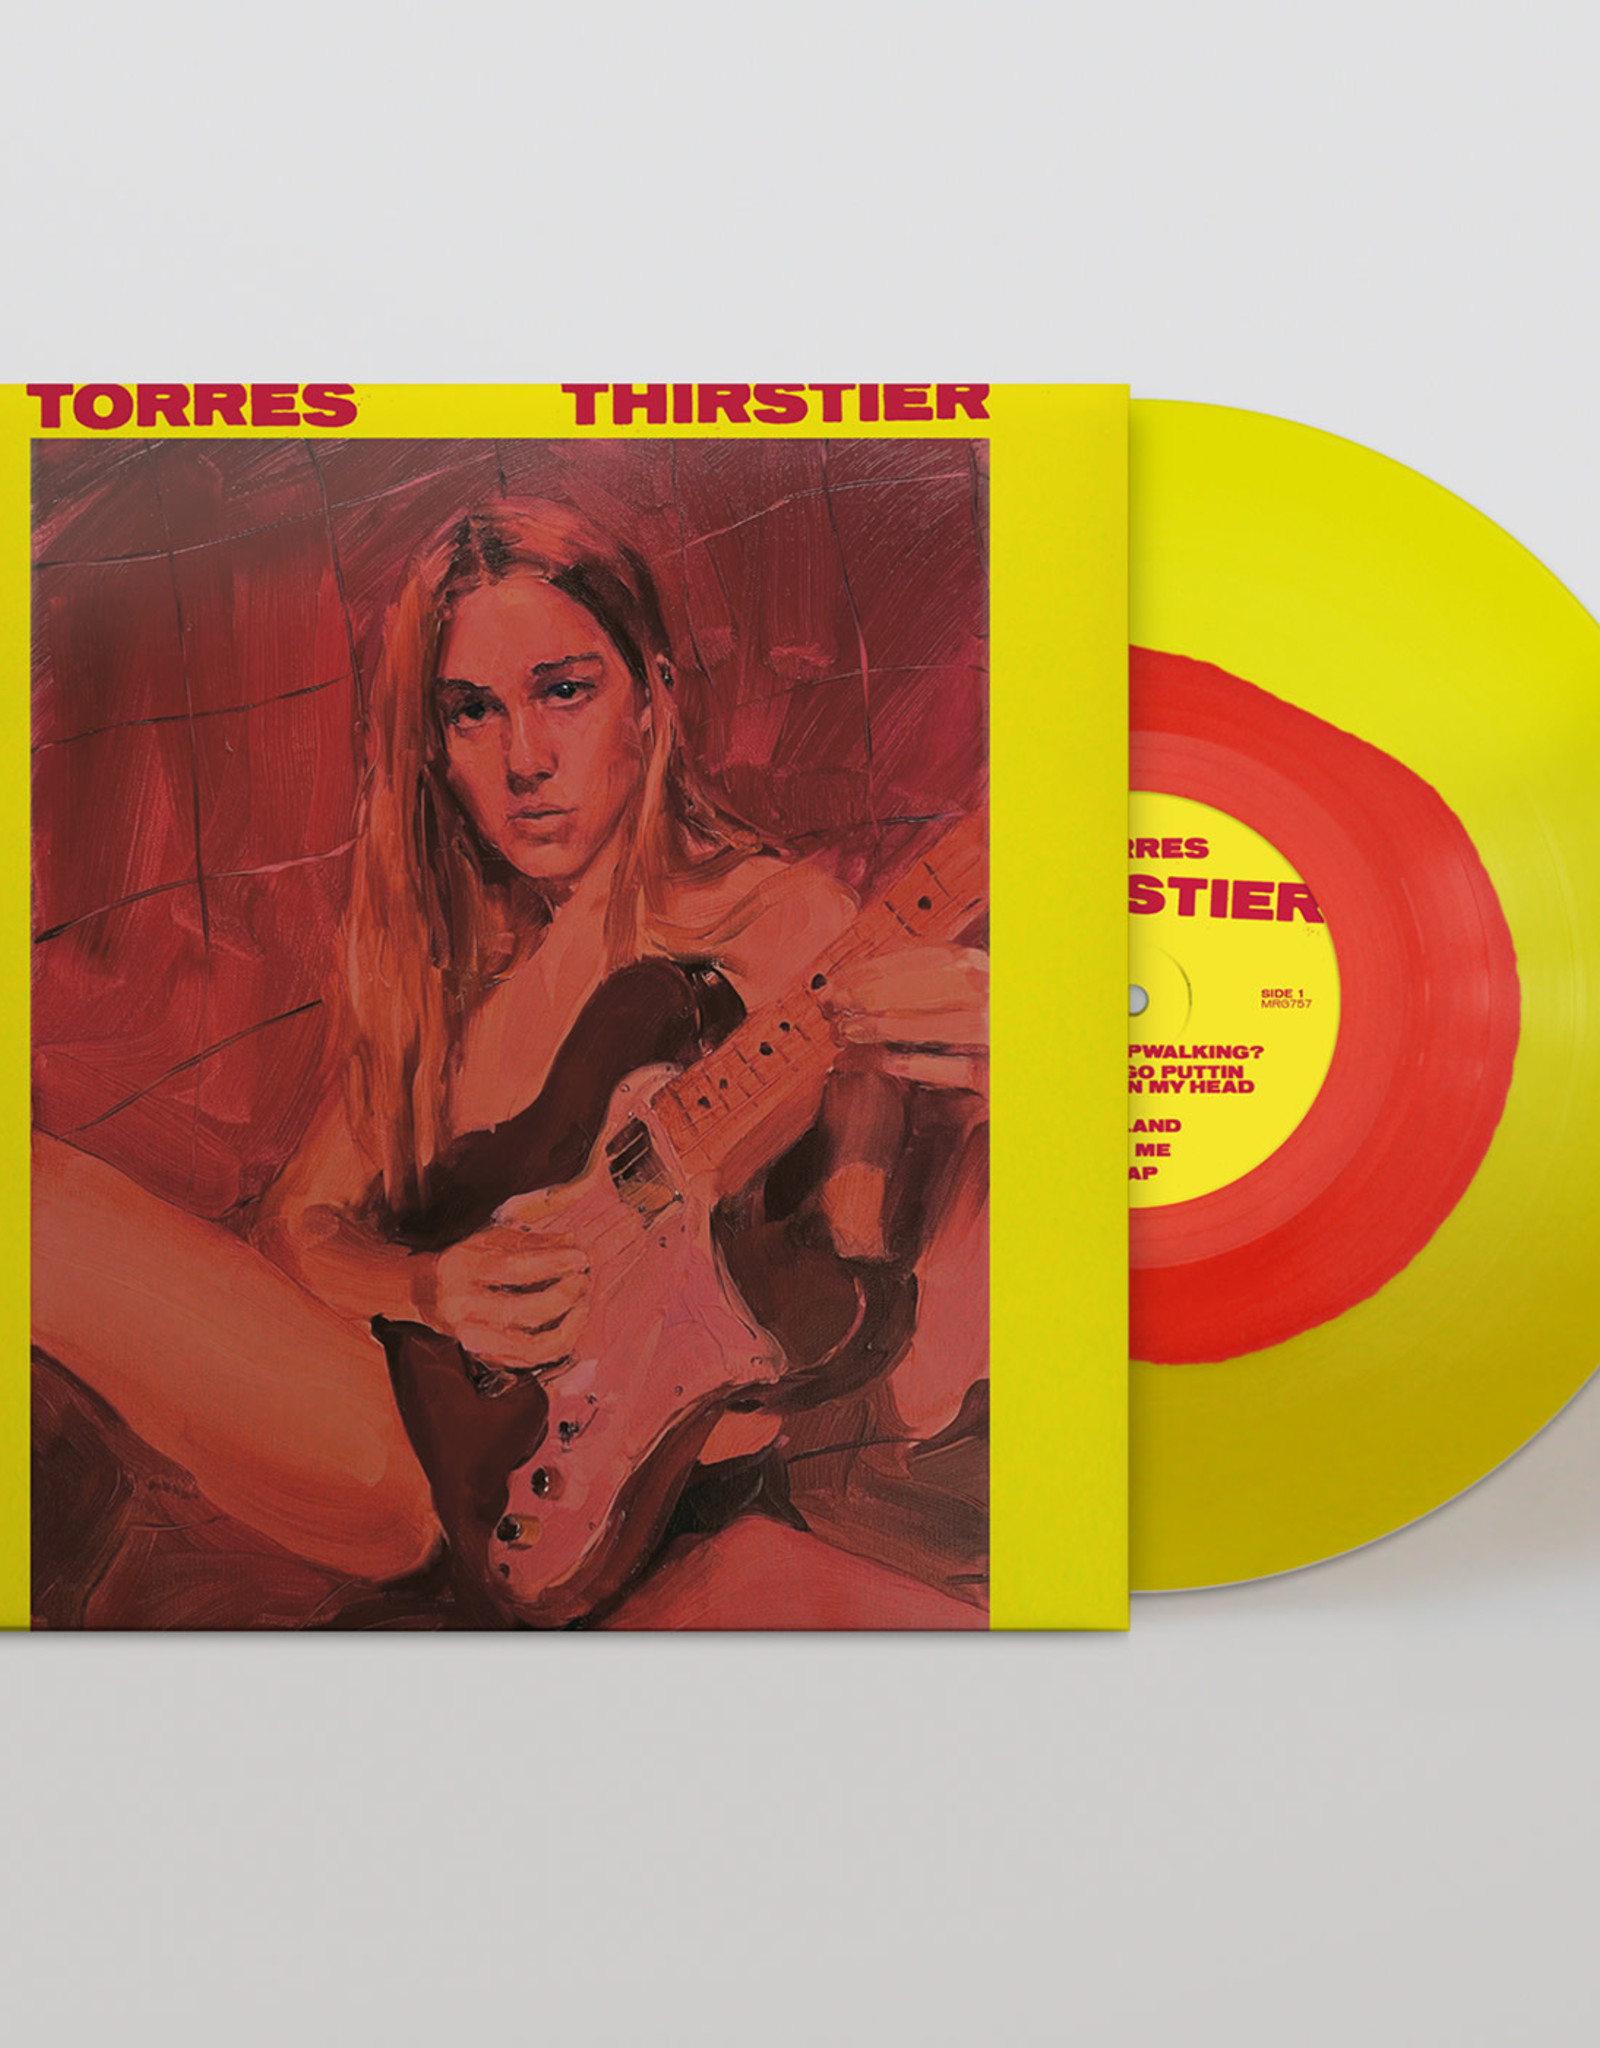 Torres - Thirstier (Red & Yellow Vinyl) PREORDER DROPS 7/30/21